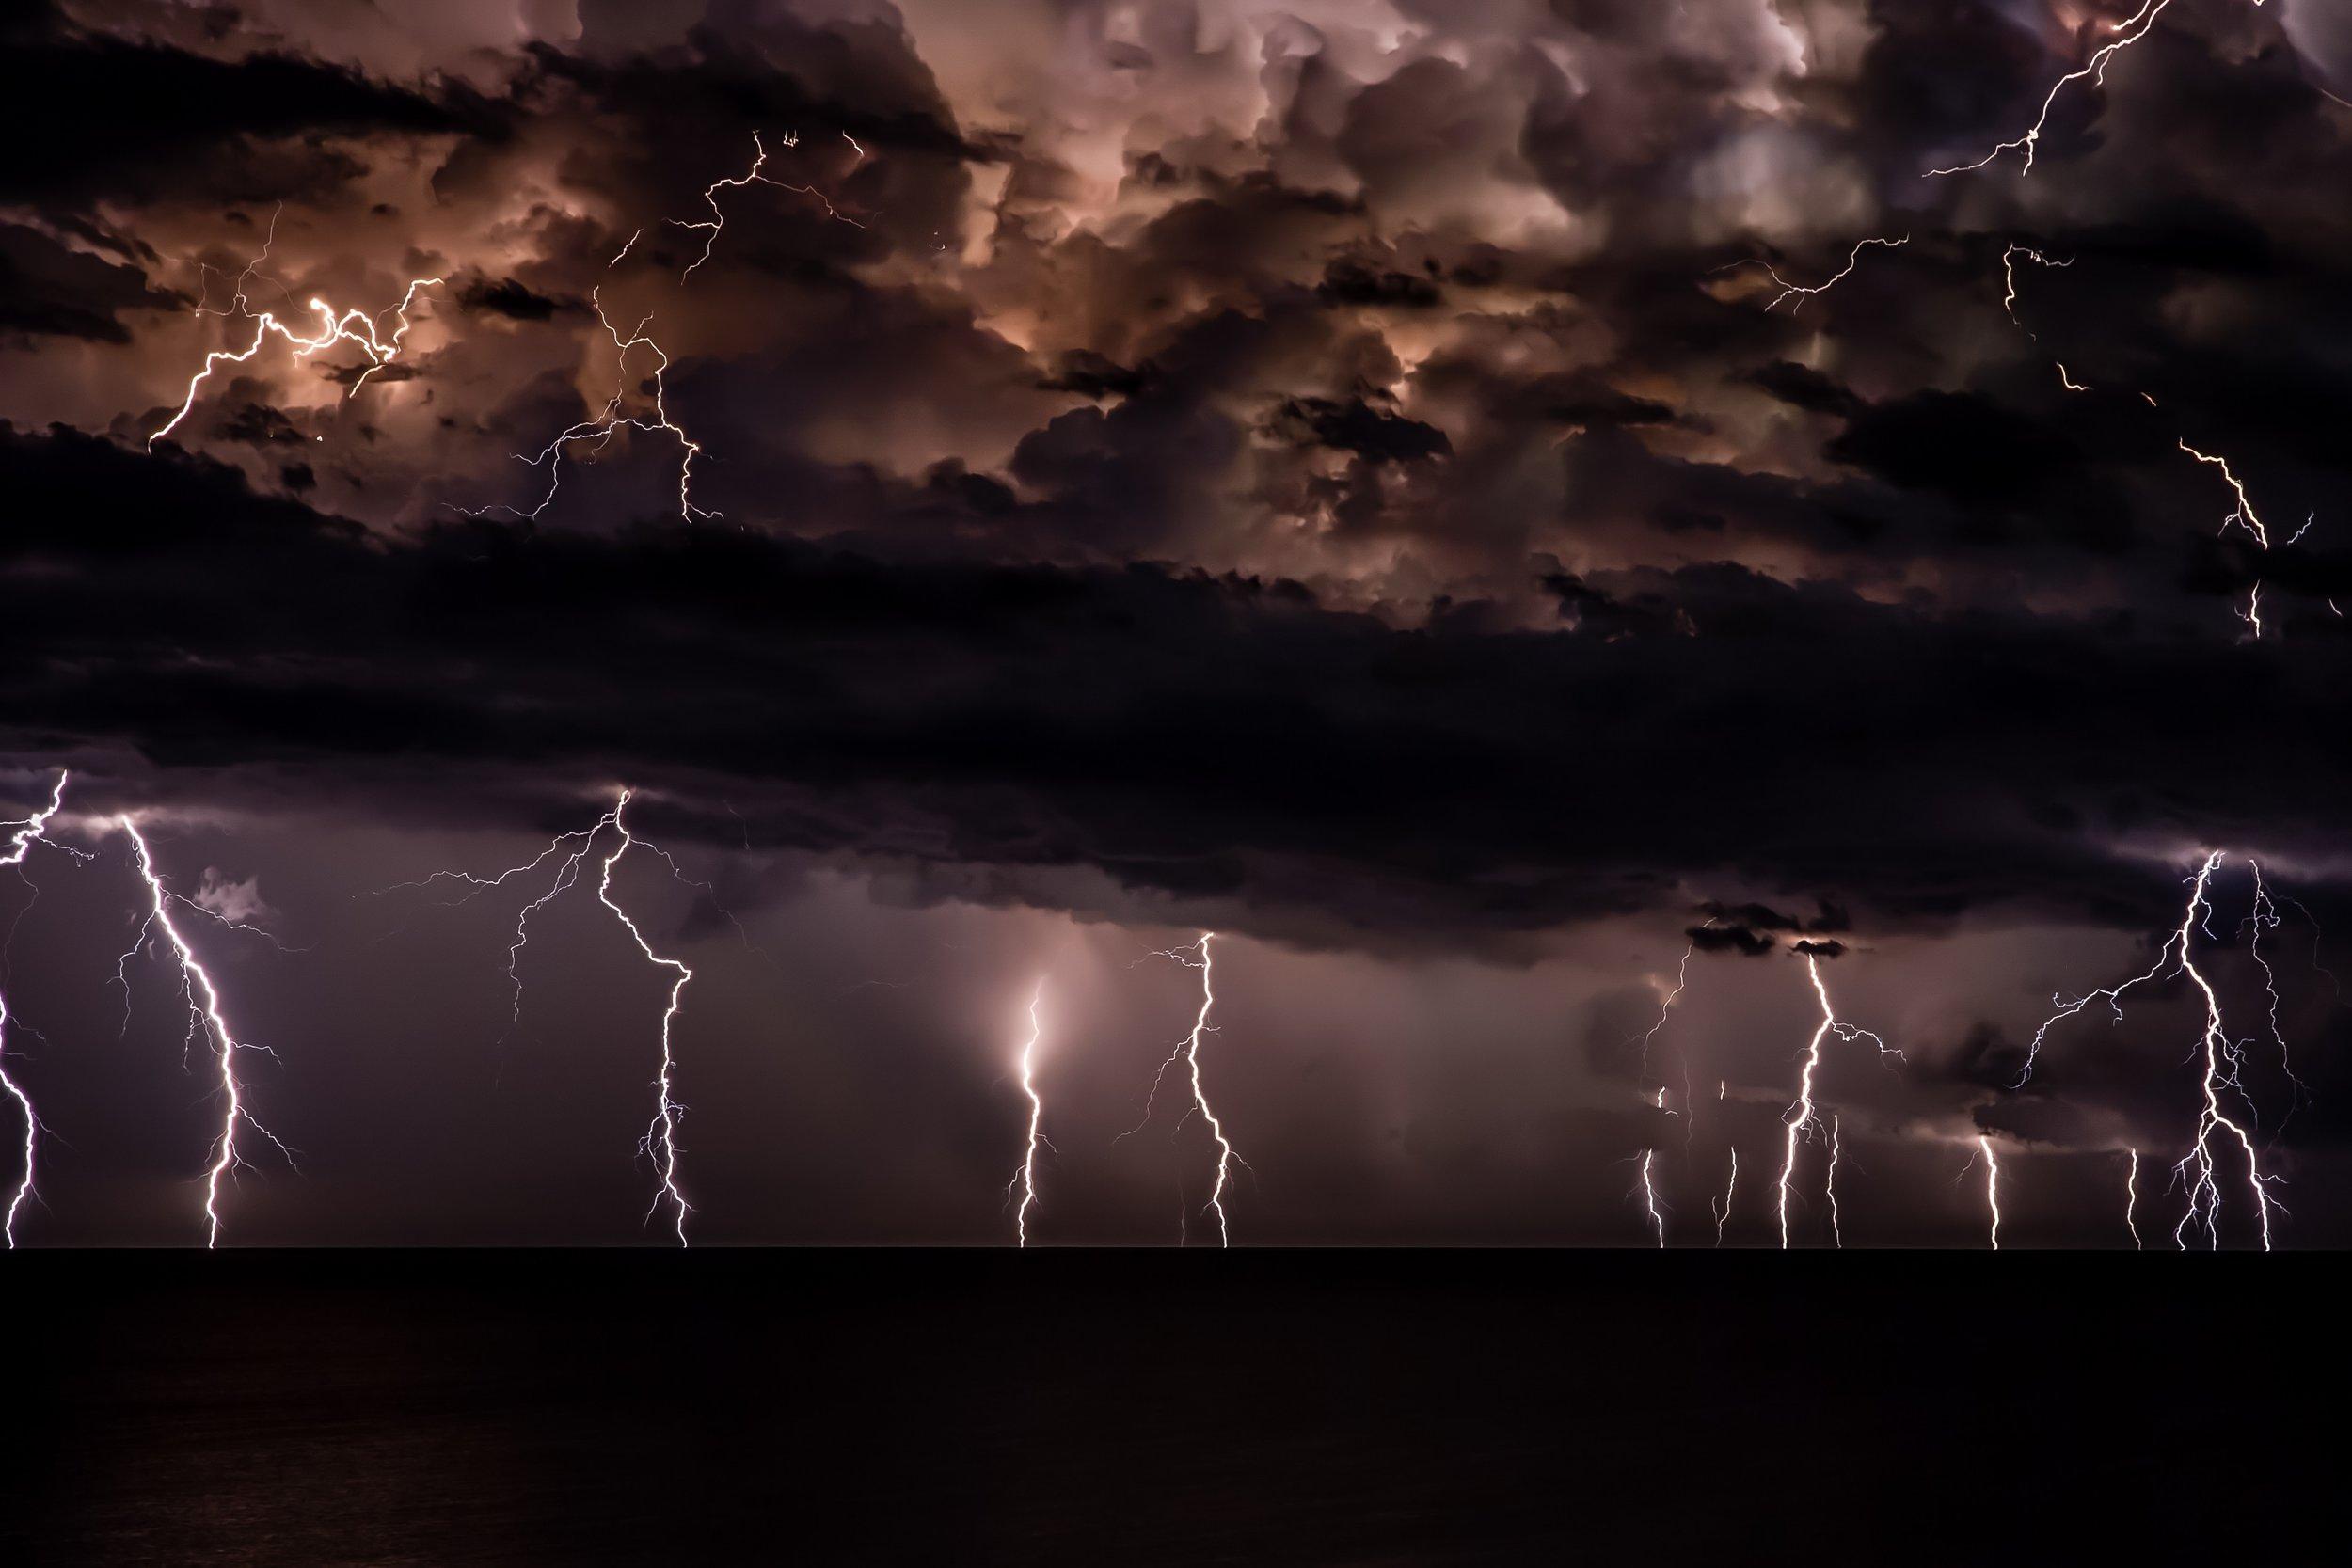 Photo by Josep Castells on Unsplash.com